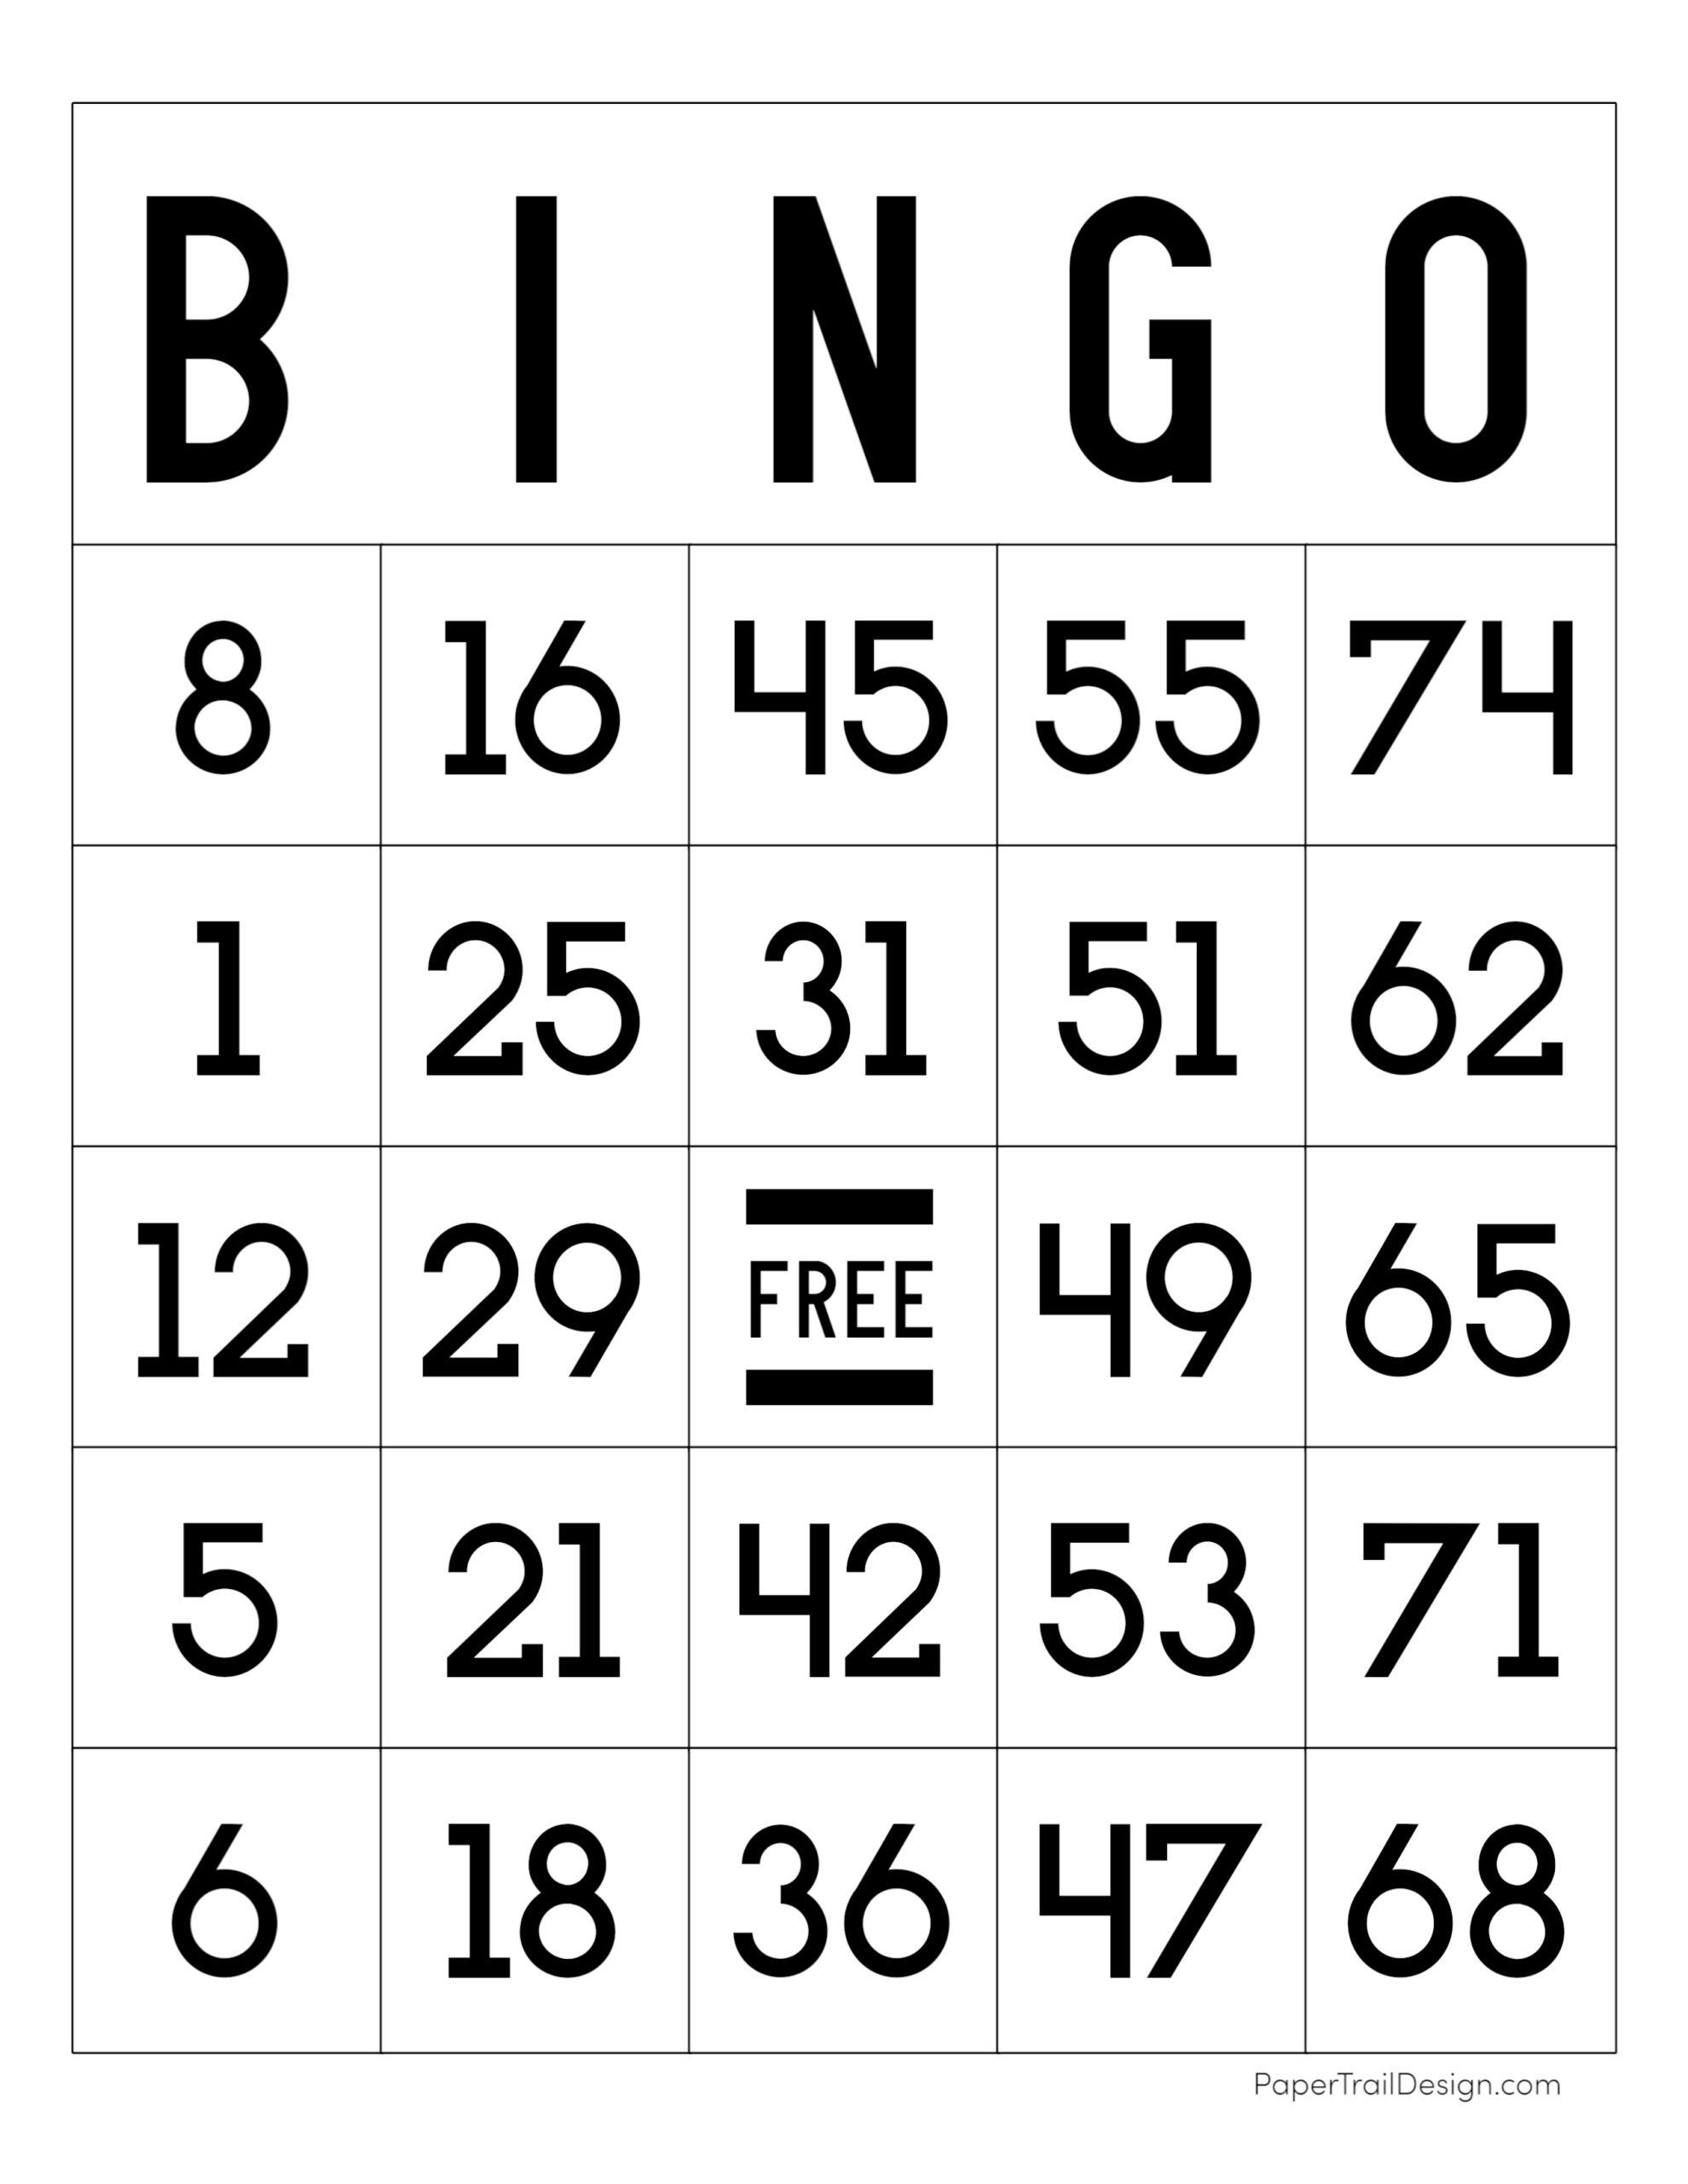 Free Printable Bingo Cards Paper Trail Design